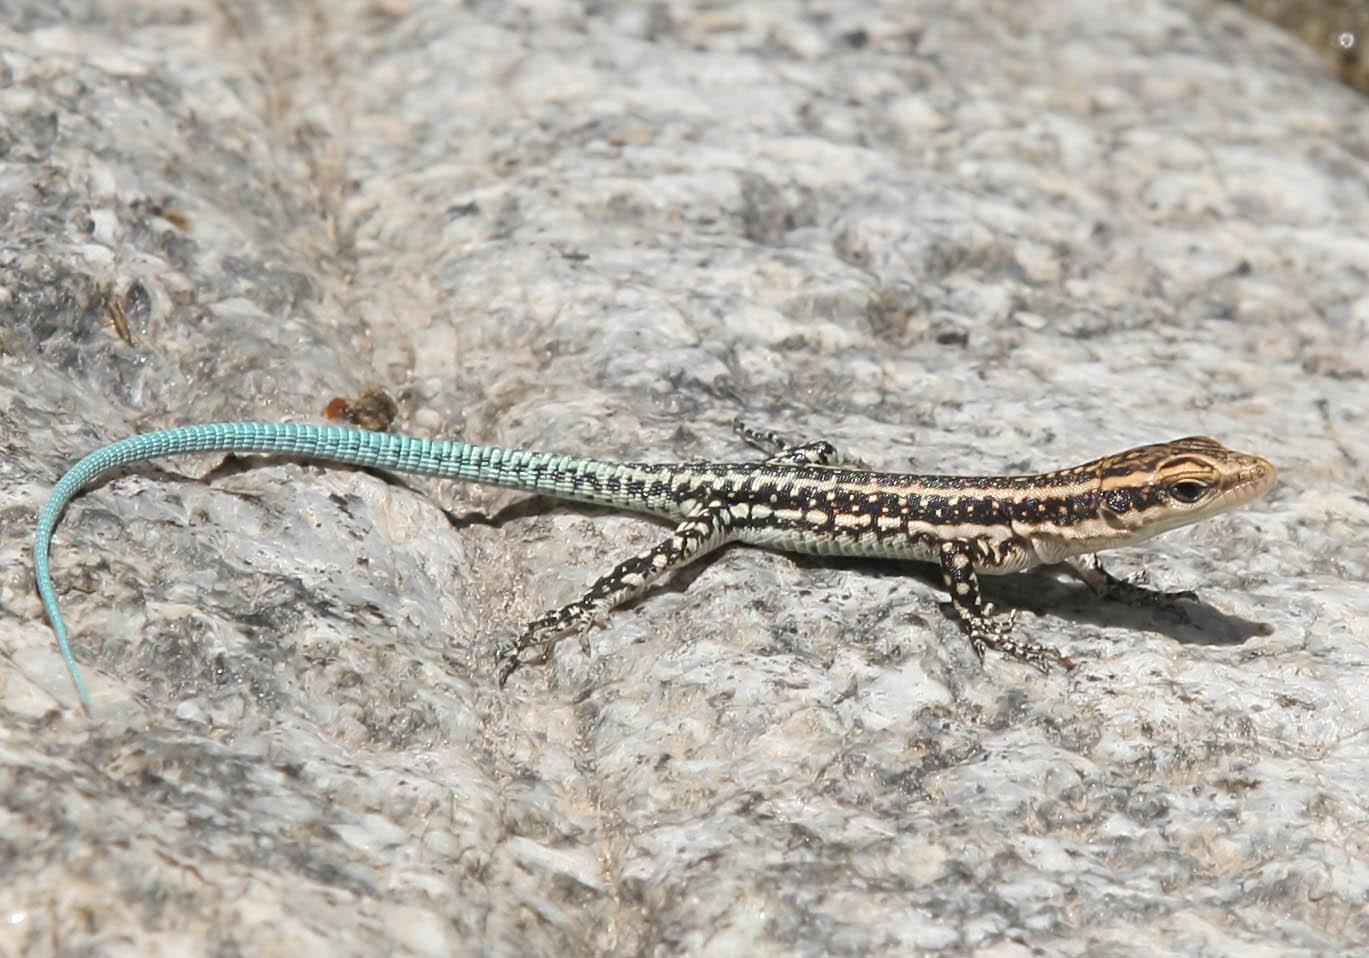 Anatololacerta oerzteni - Südwestanatolische Eidechse (juv.) - Symi - Lacertidae - Eidechsen - Lizards